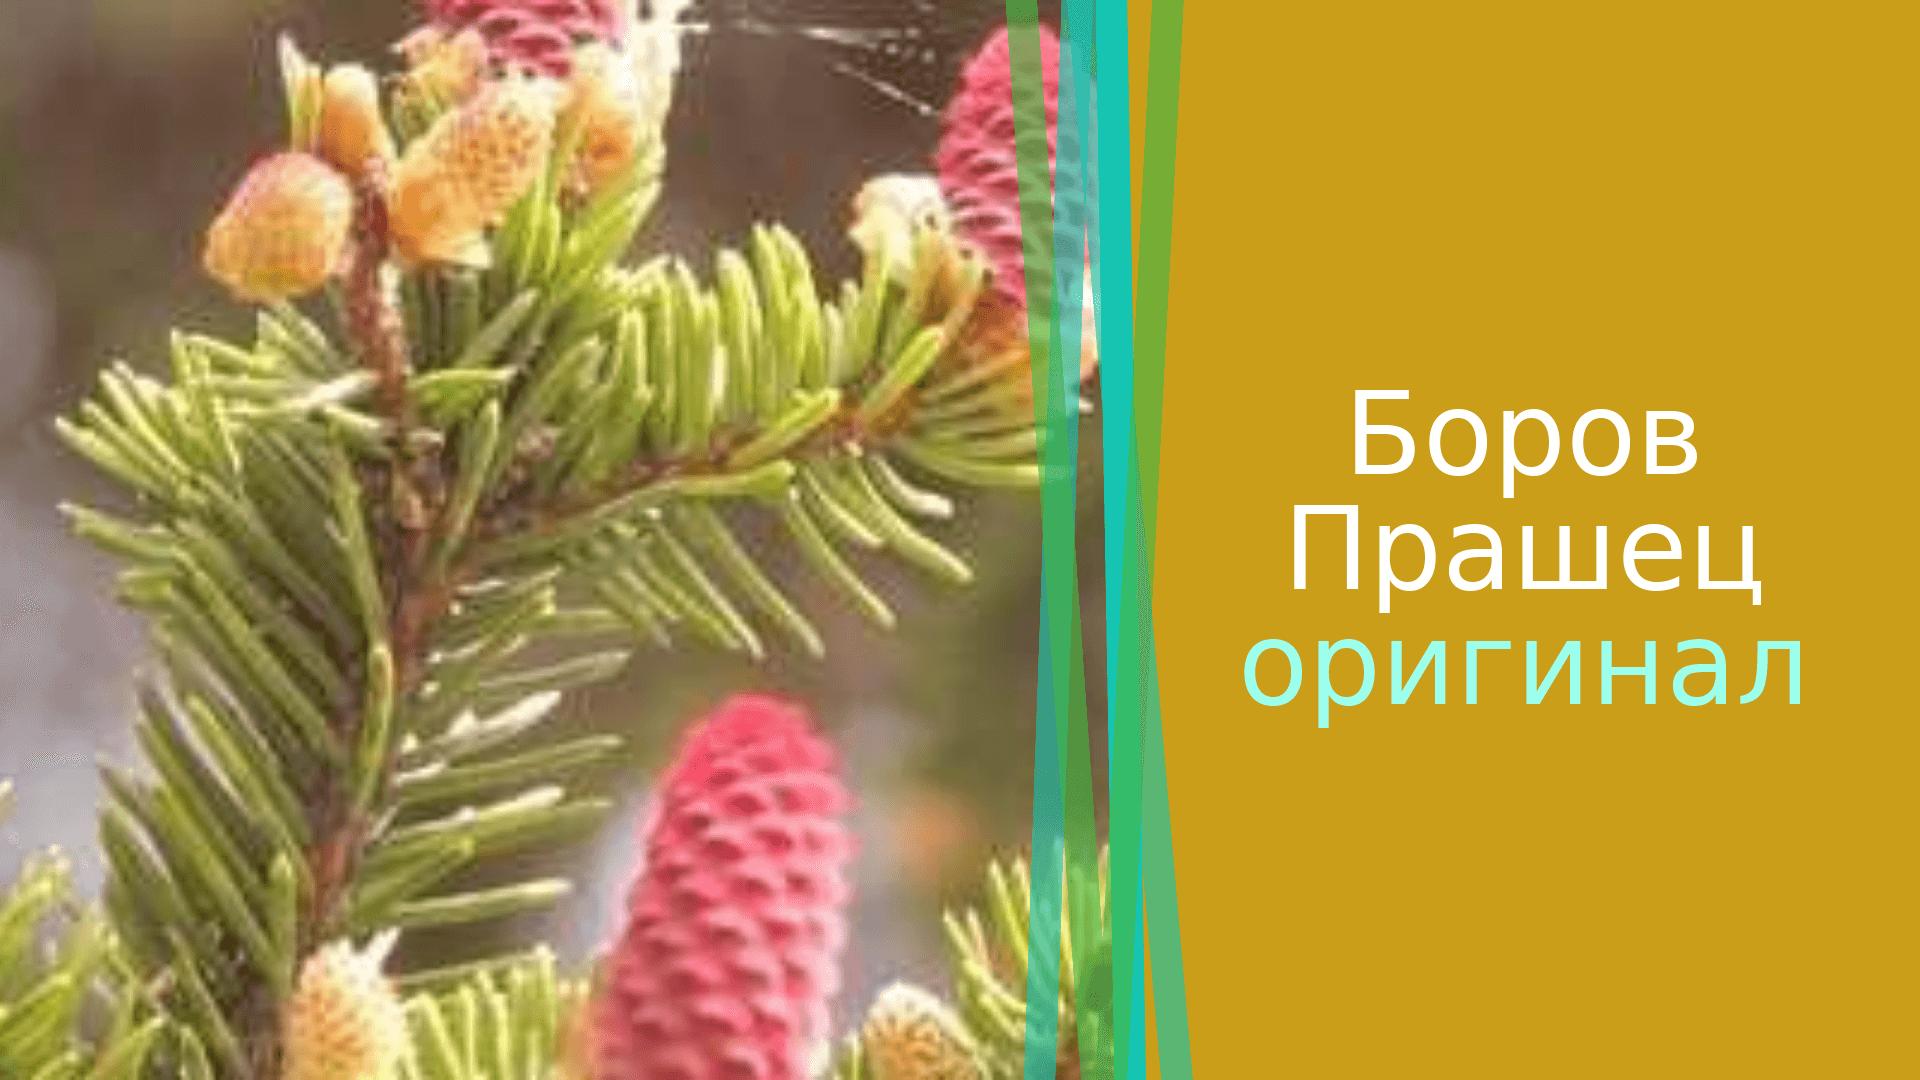 БОРОВ ПРАШЕЦ 4 НАУЧНИ ФАКТА